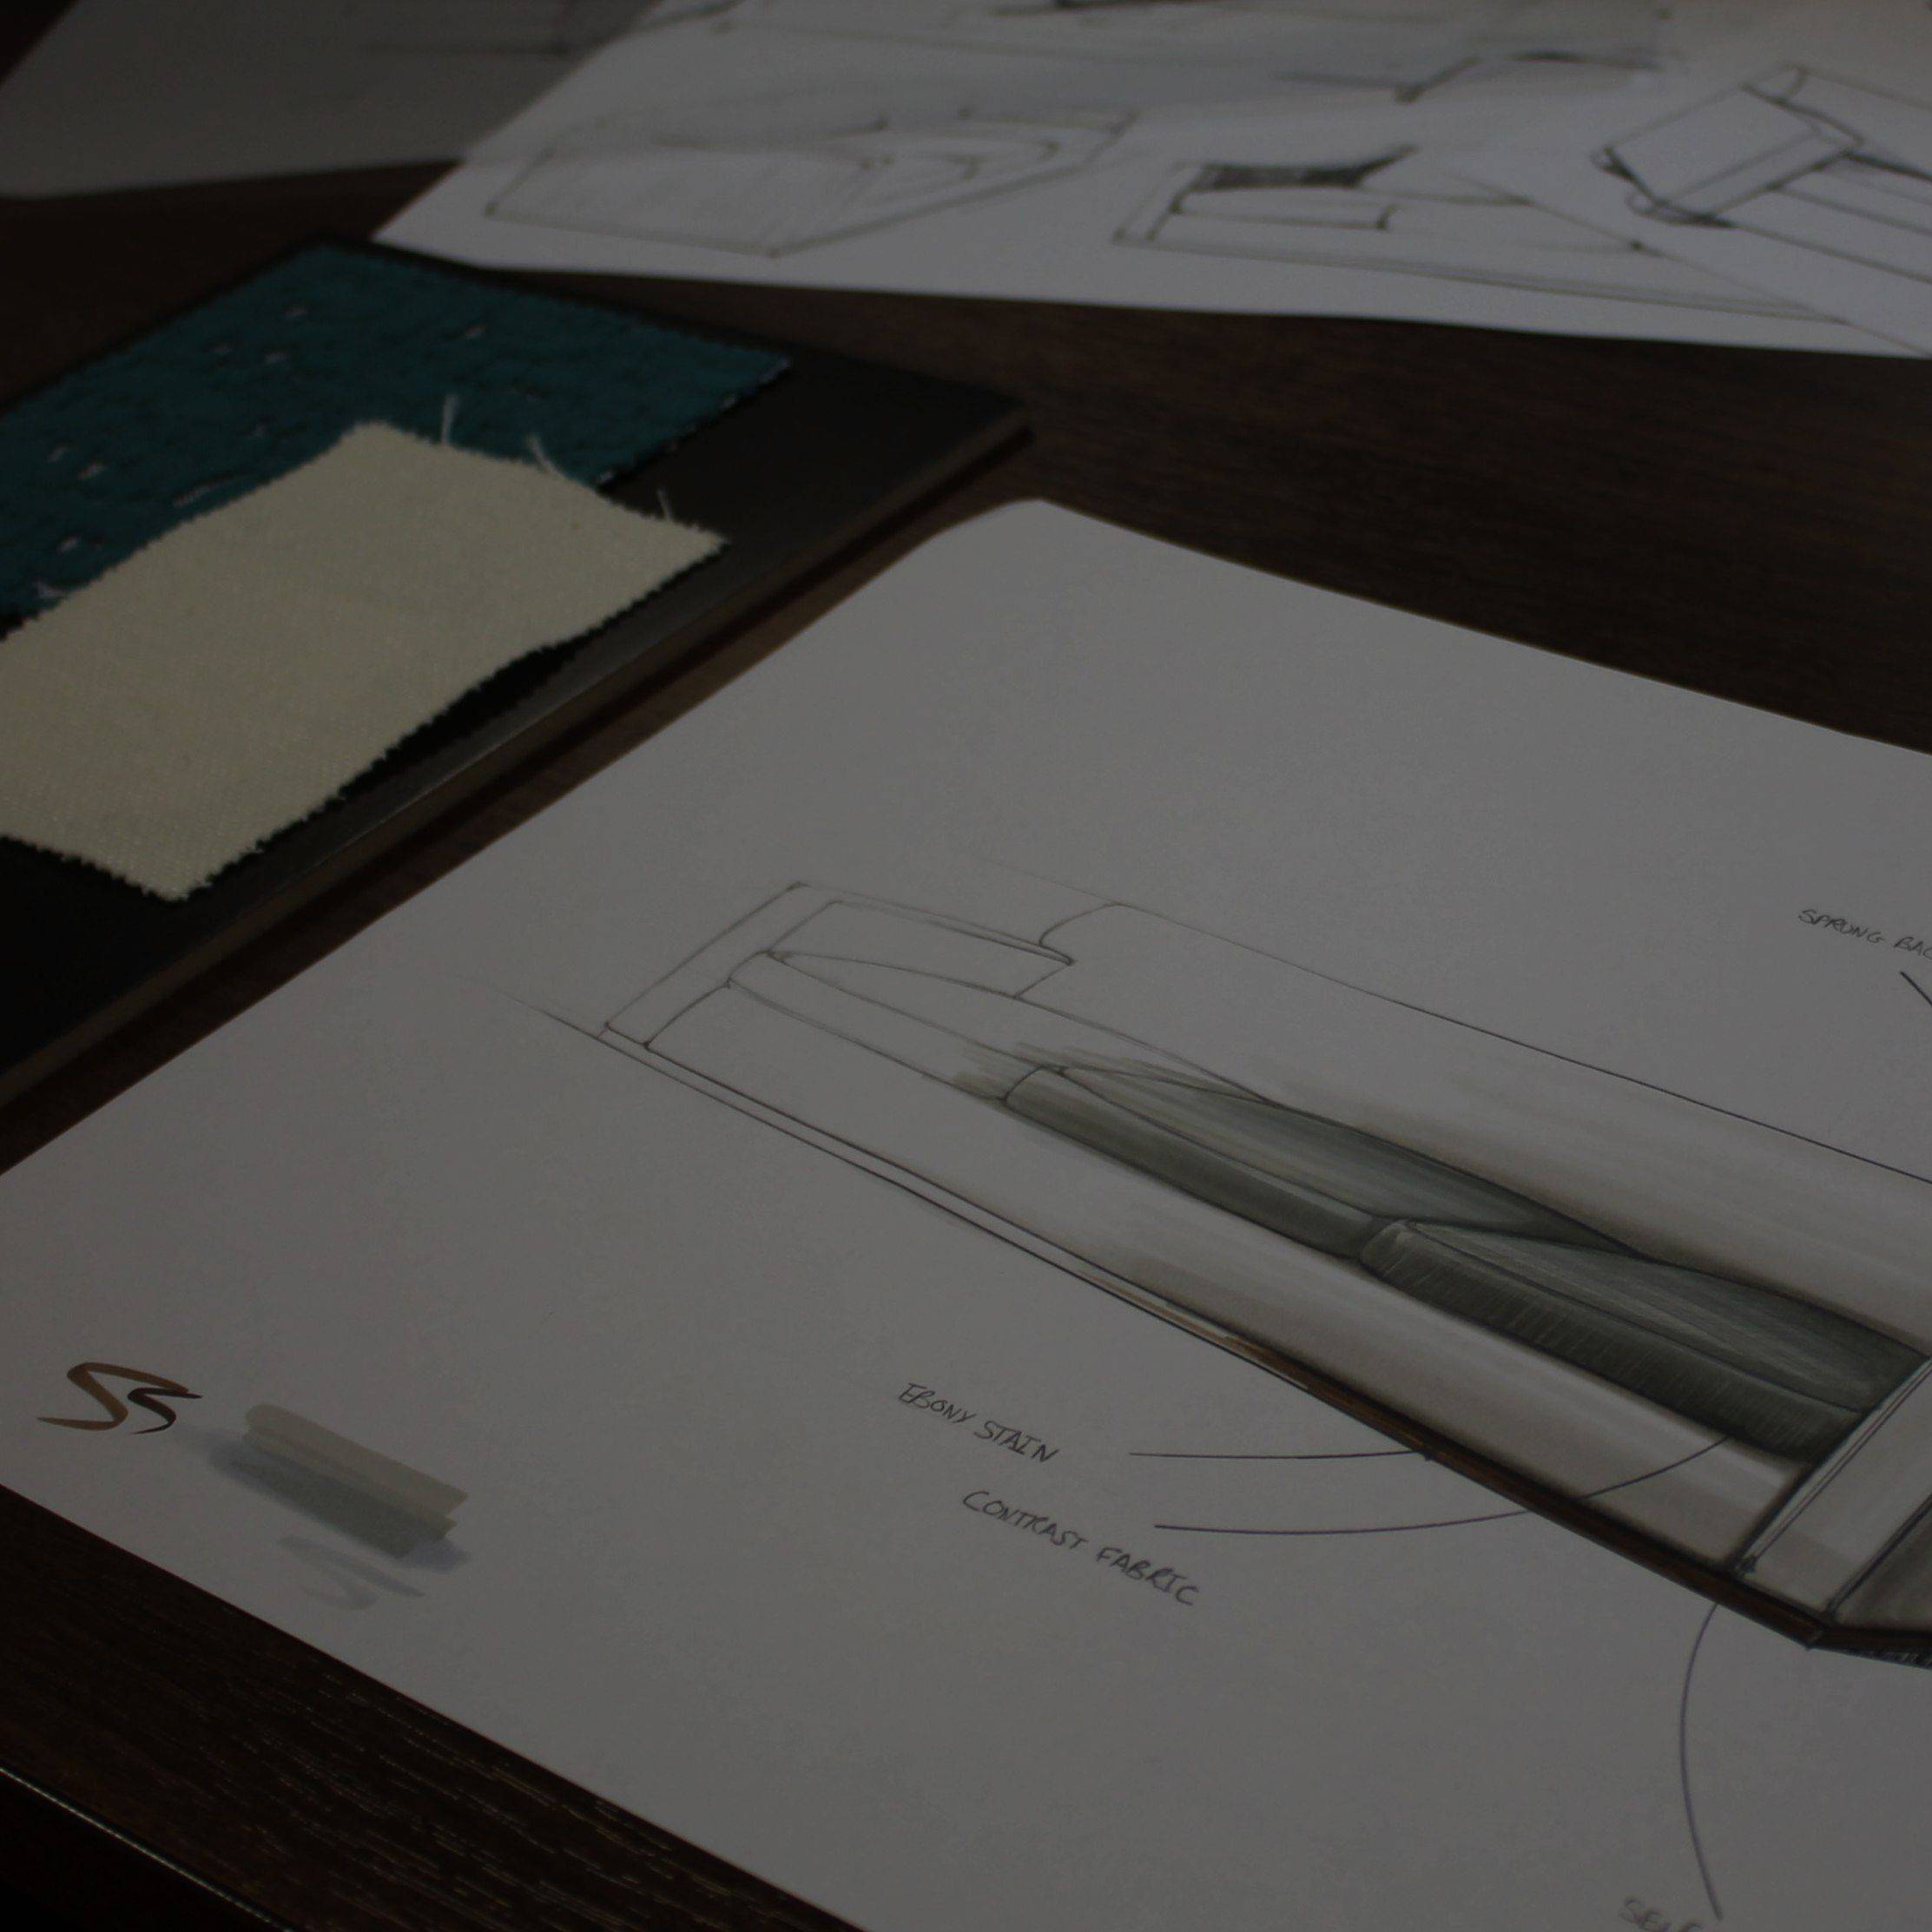 Types of Sofa Styles - Sofa Designs - The Sofa Guide - LuxDeco.com